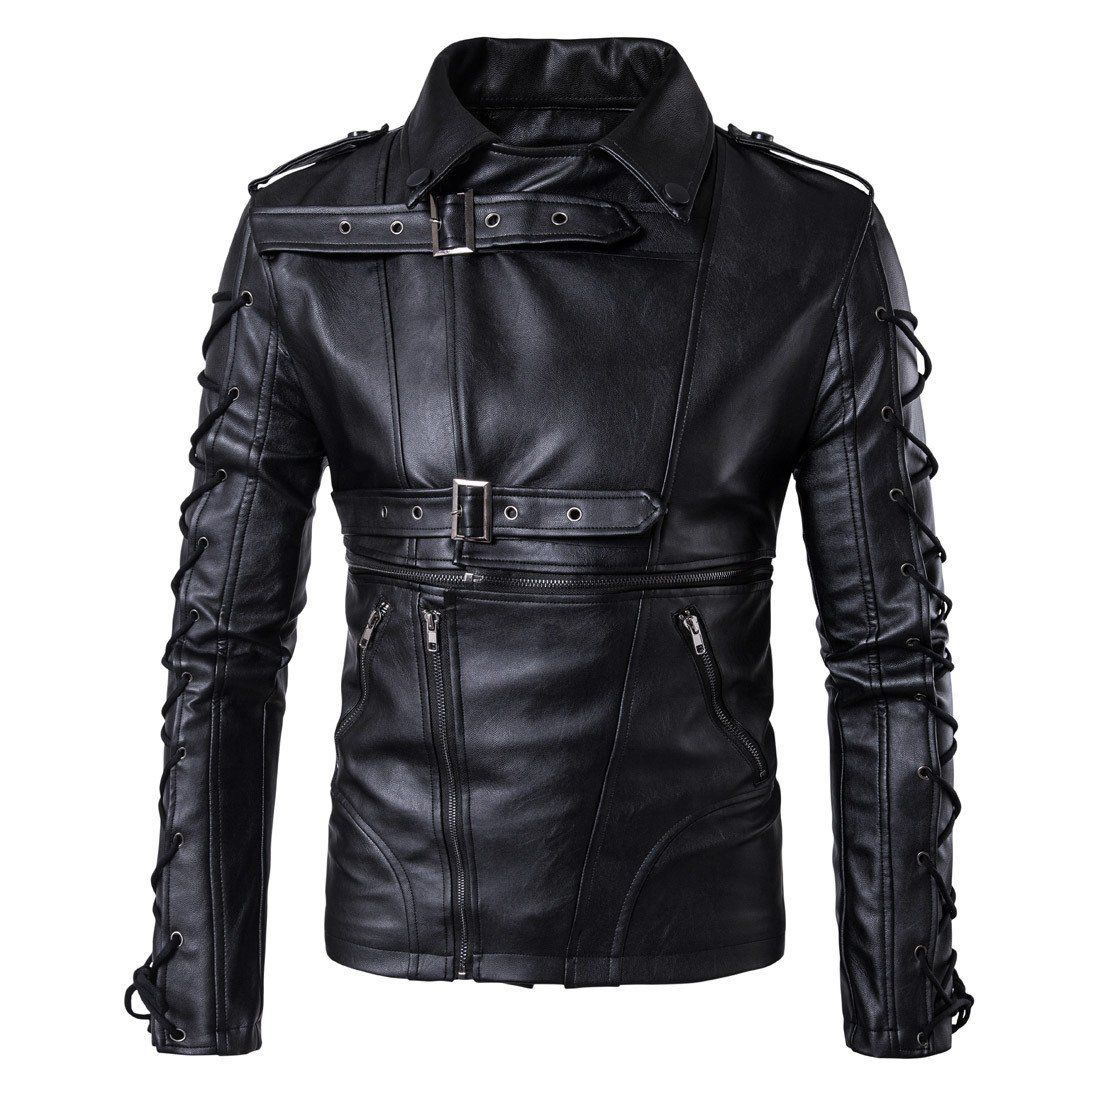 Motorcycle Style Leather Jacket Winter leather jackets